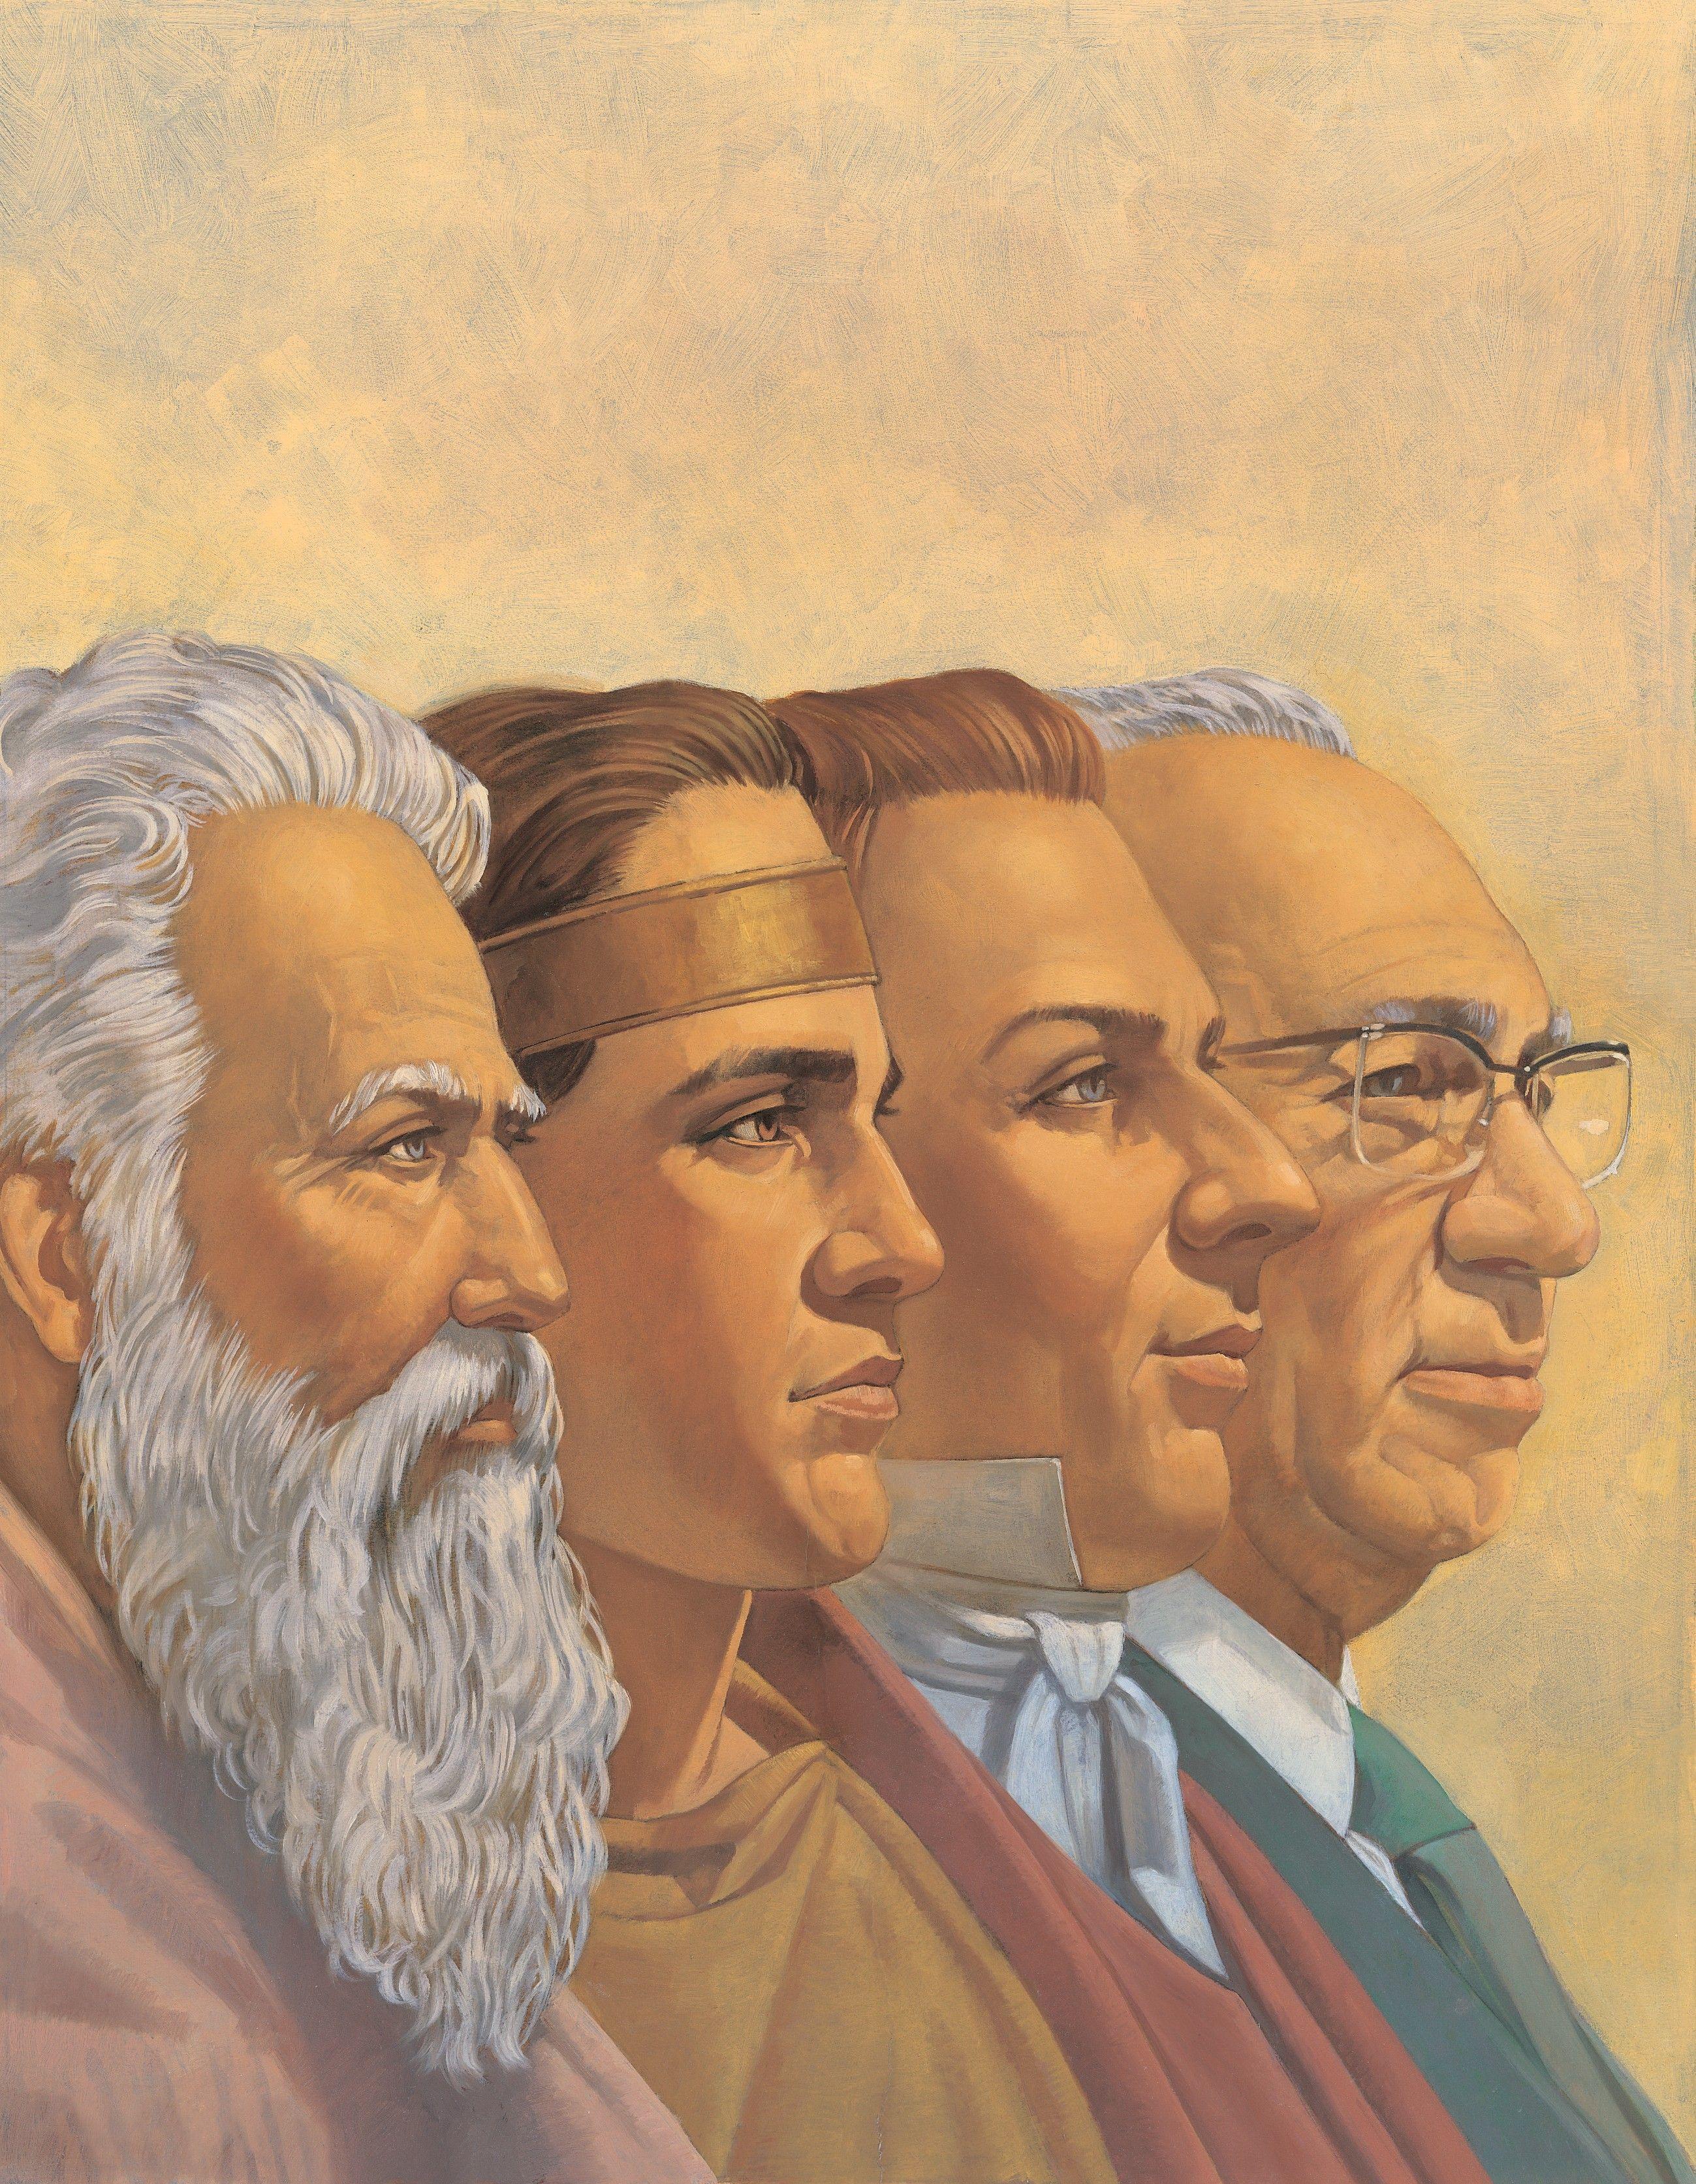 Four Prophets, by Robert T. Barrett